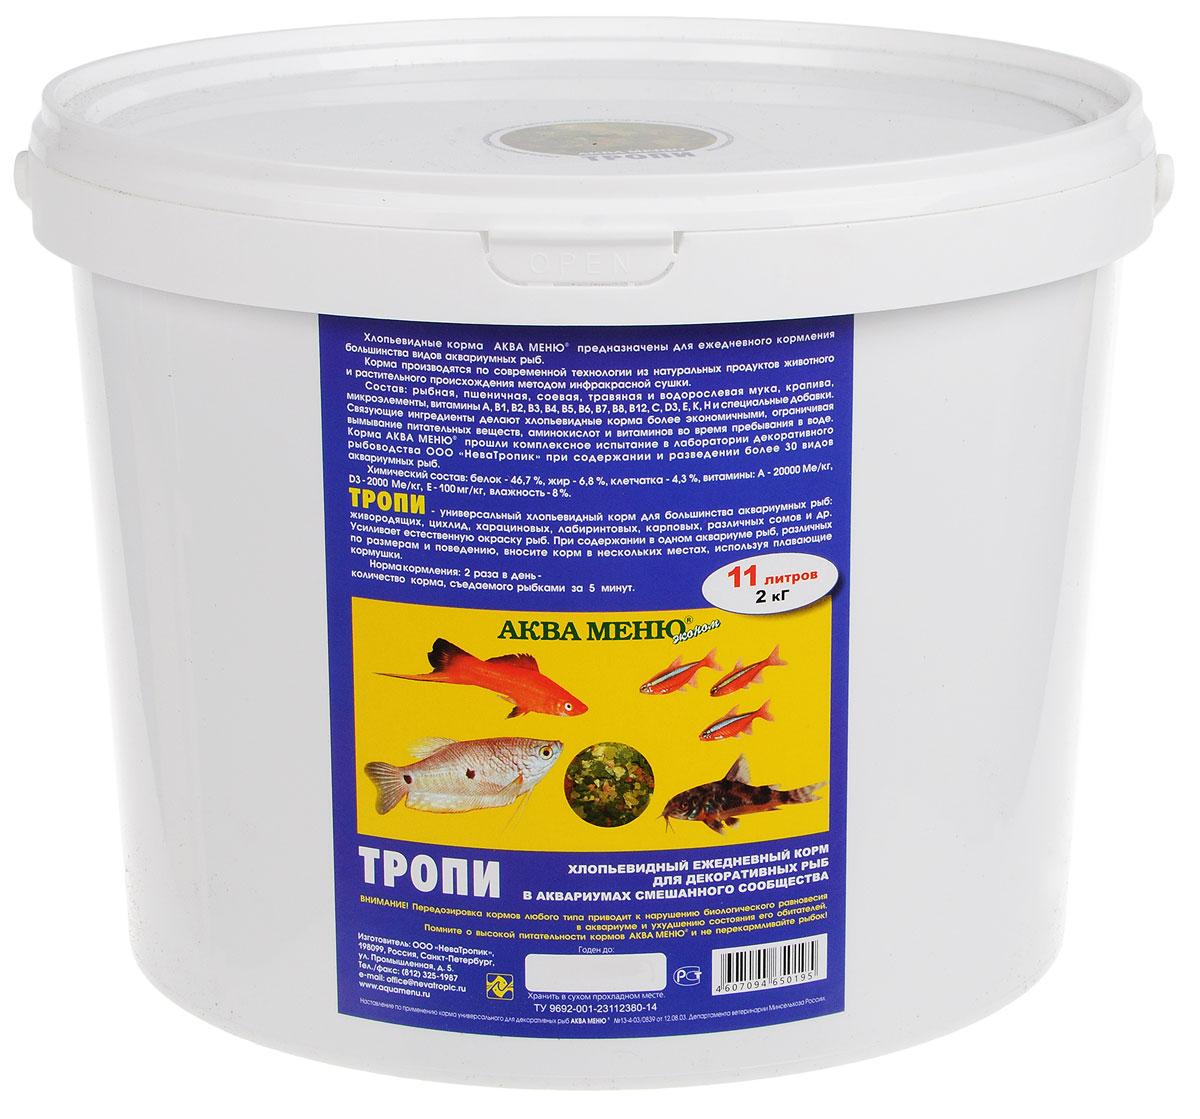 Корм Аква Меню Тропи, для декоративных рыб, 11 л (2 кг) корм для рыб аква меню флора 2 с растительными добавками для рыб средних размеров 30 г